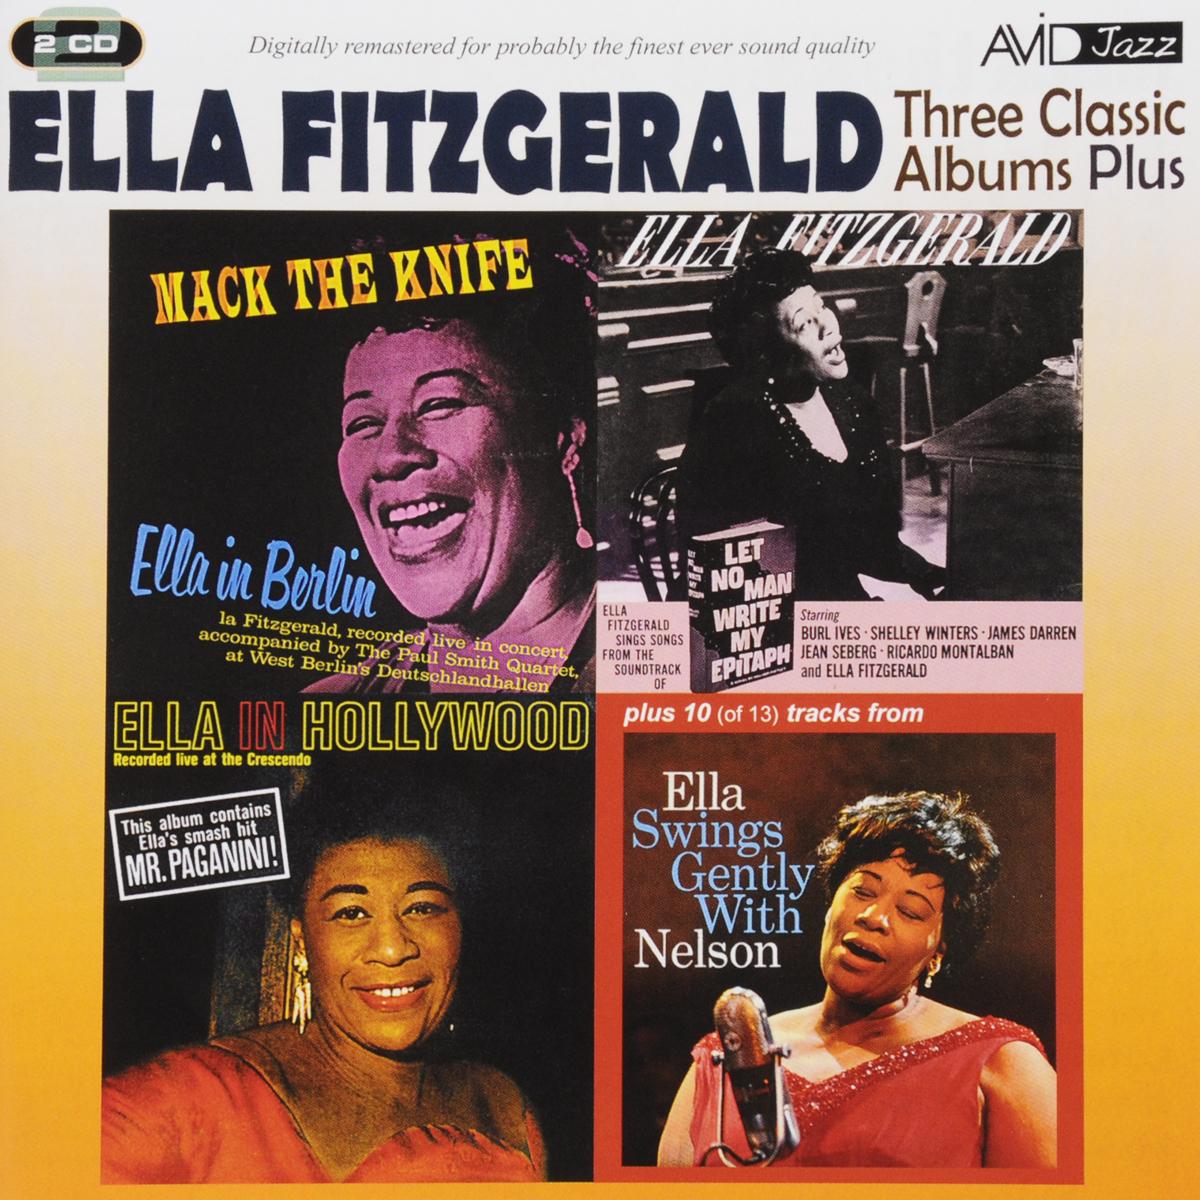 Элла Фитцжеральд Ella Fitzgerald. Three Classic Albums Plus (2 CD) элла фитцжеральд ella fitzgerald standards